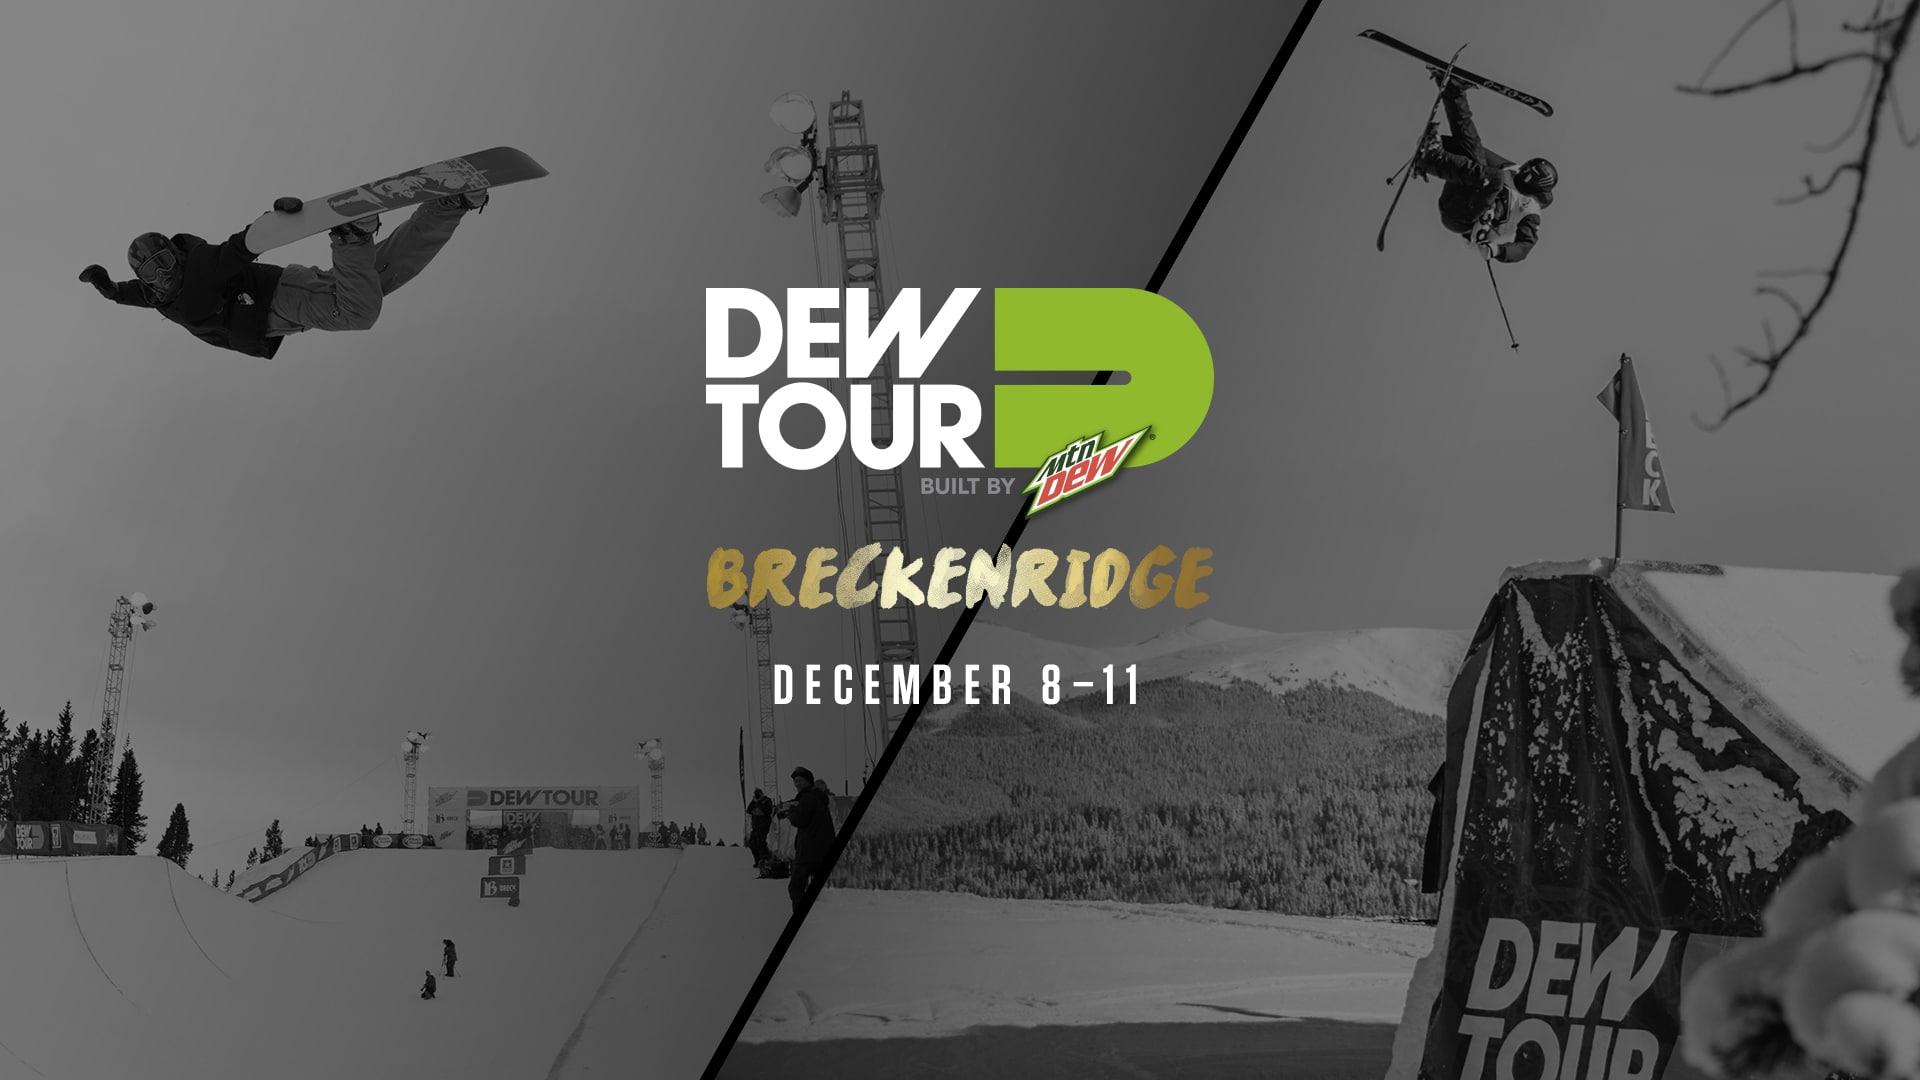 Dew Tour Breckenridge – Athlete and Team Lineup